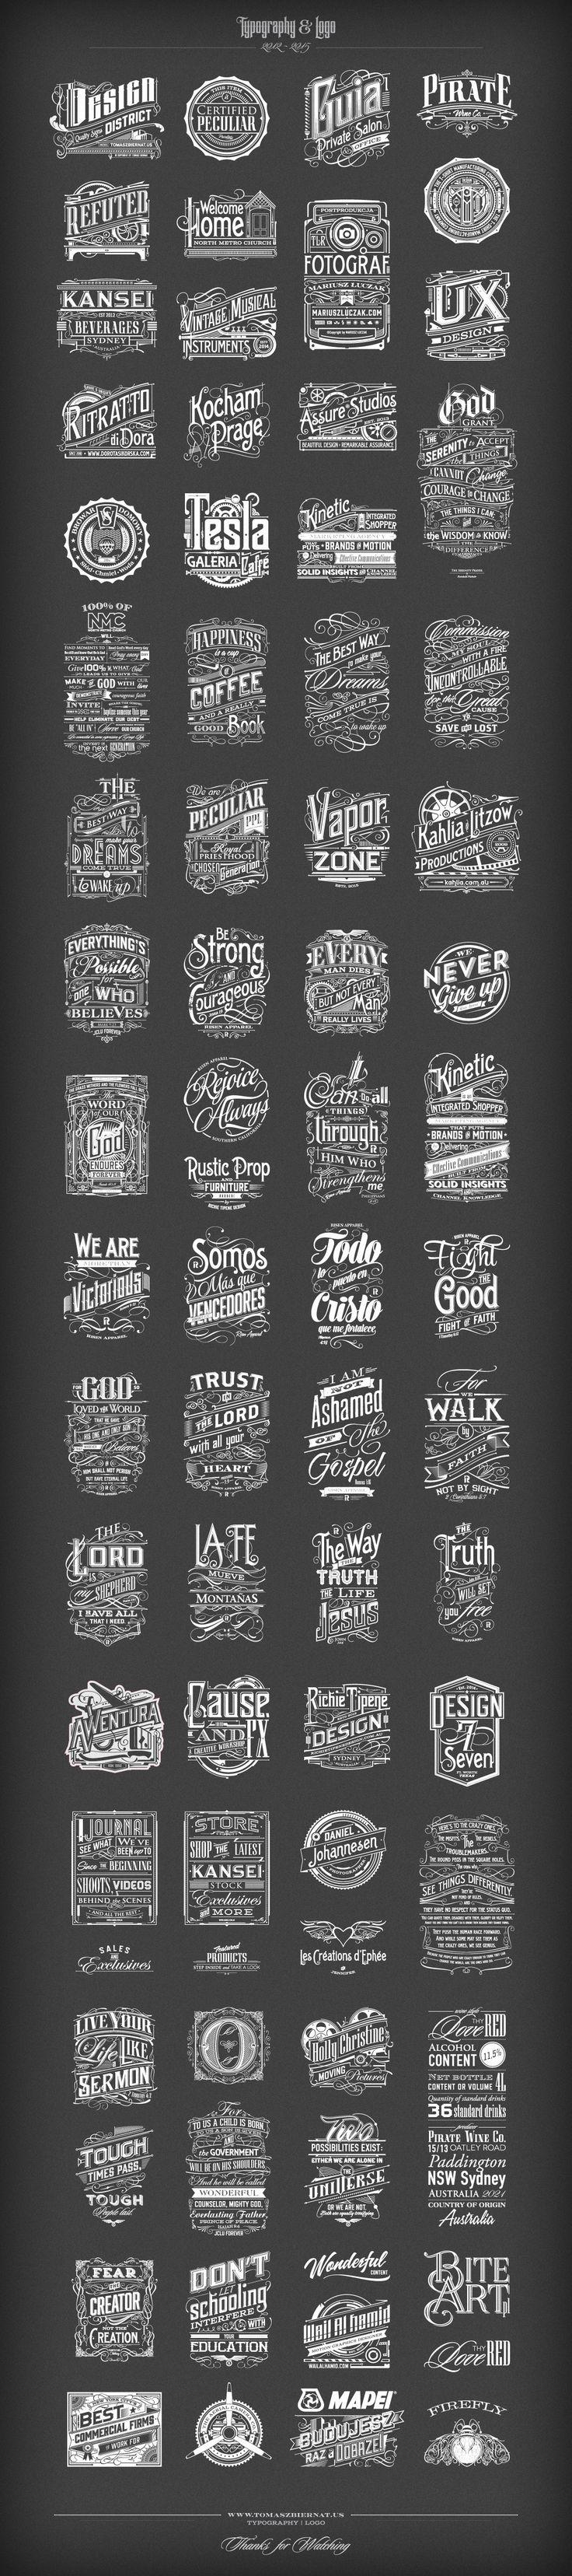 Typography | Logo 2012-2015 on Behance by Tomasz Biernat